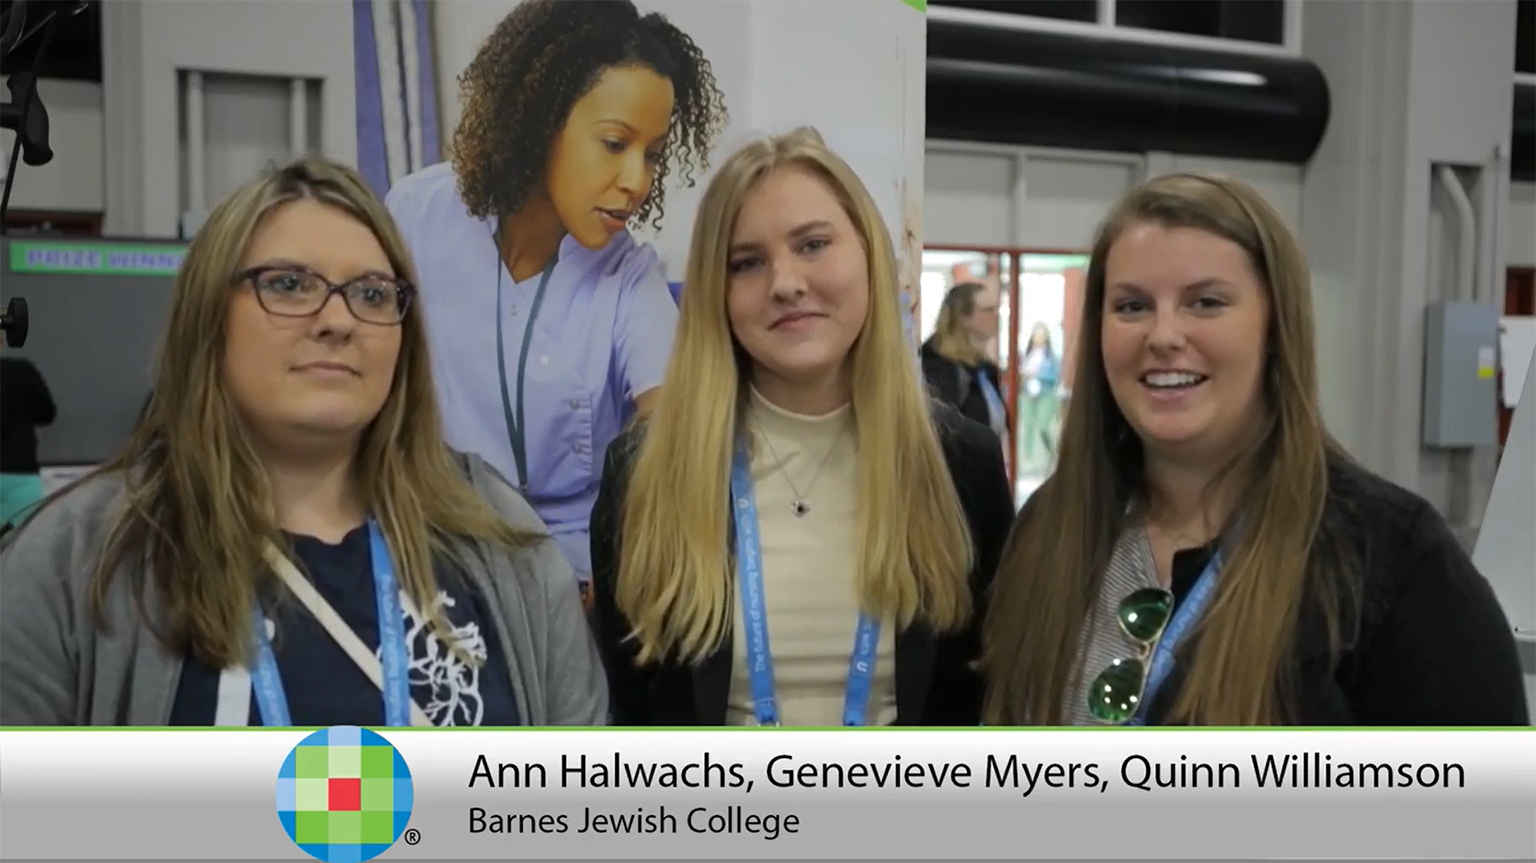 Screenshot of Lippincott PassPoint testimonial video of Ann Halwachs, Genevieve Myers, and Quinn Williamson